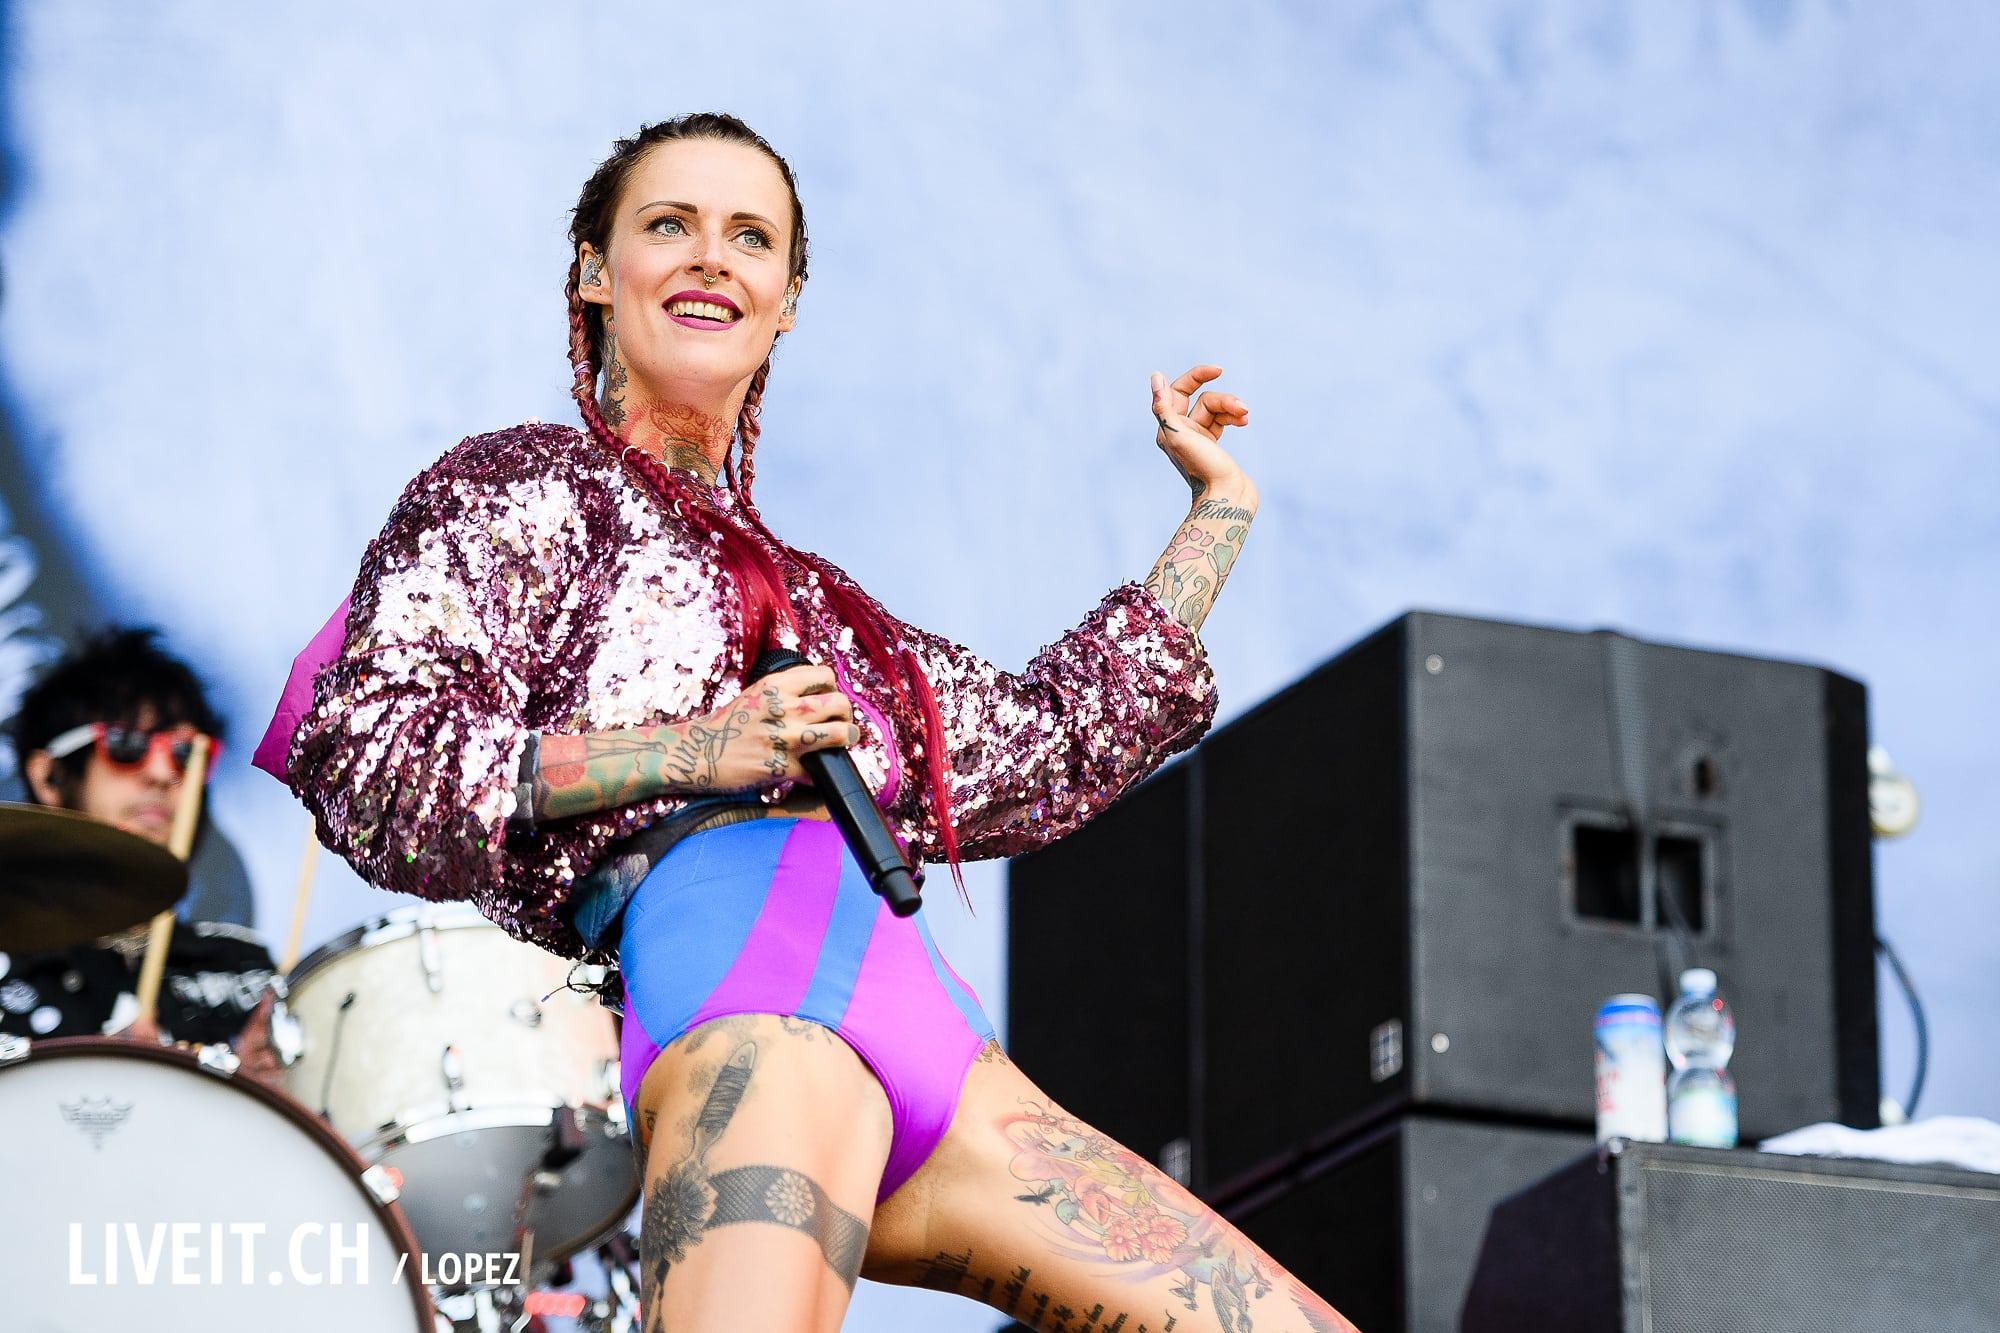 liveitch  Jennifer Rostock am Greenfield Festival 2016